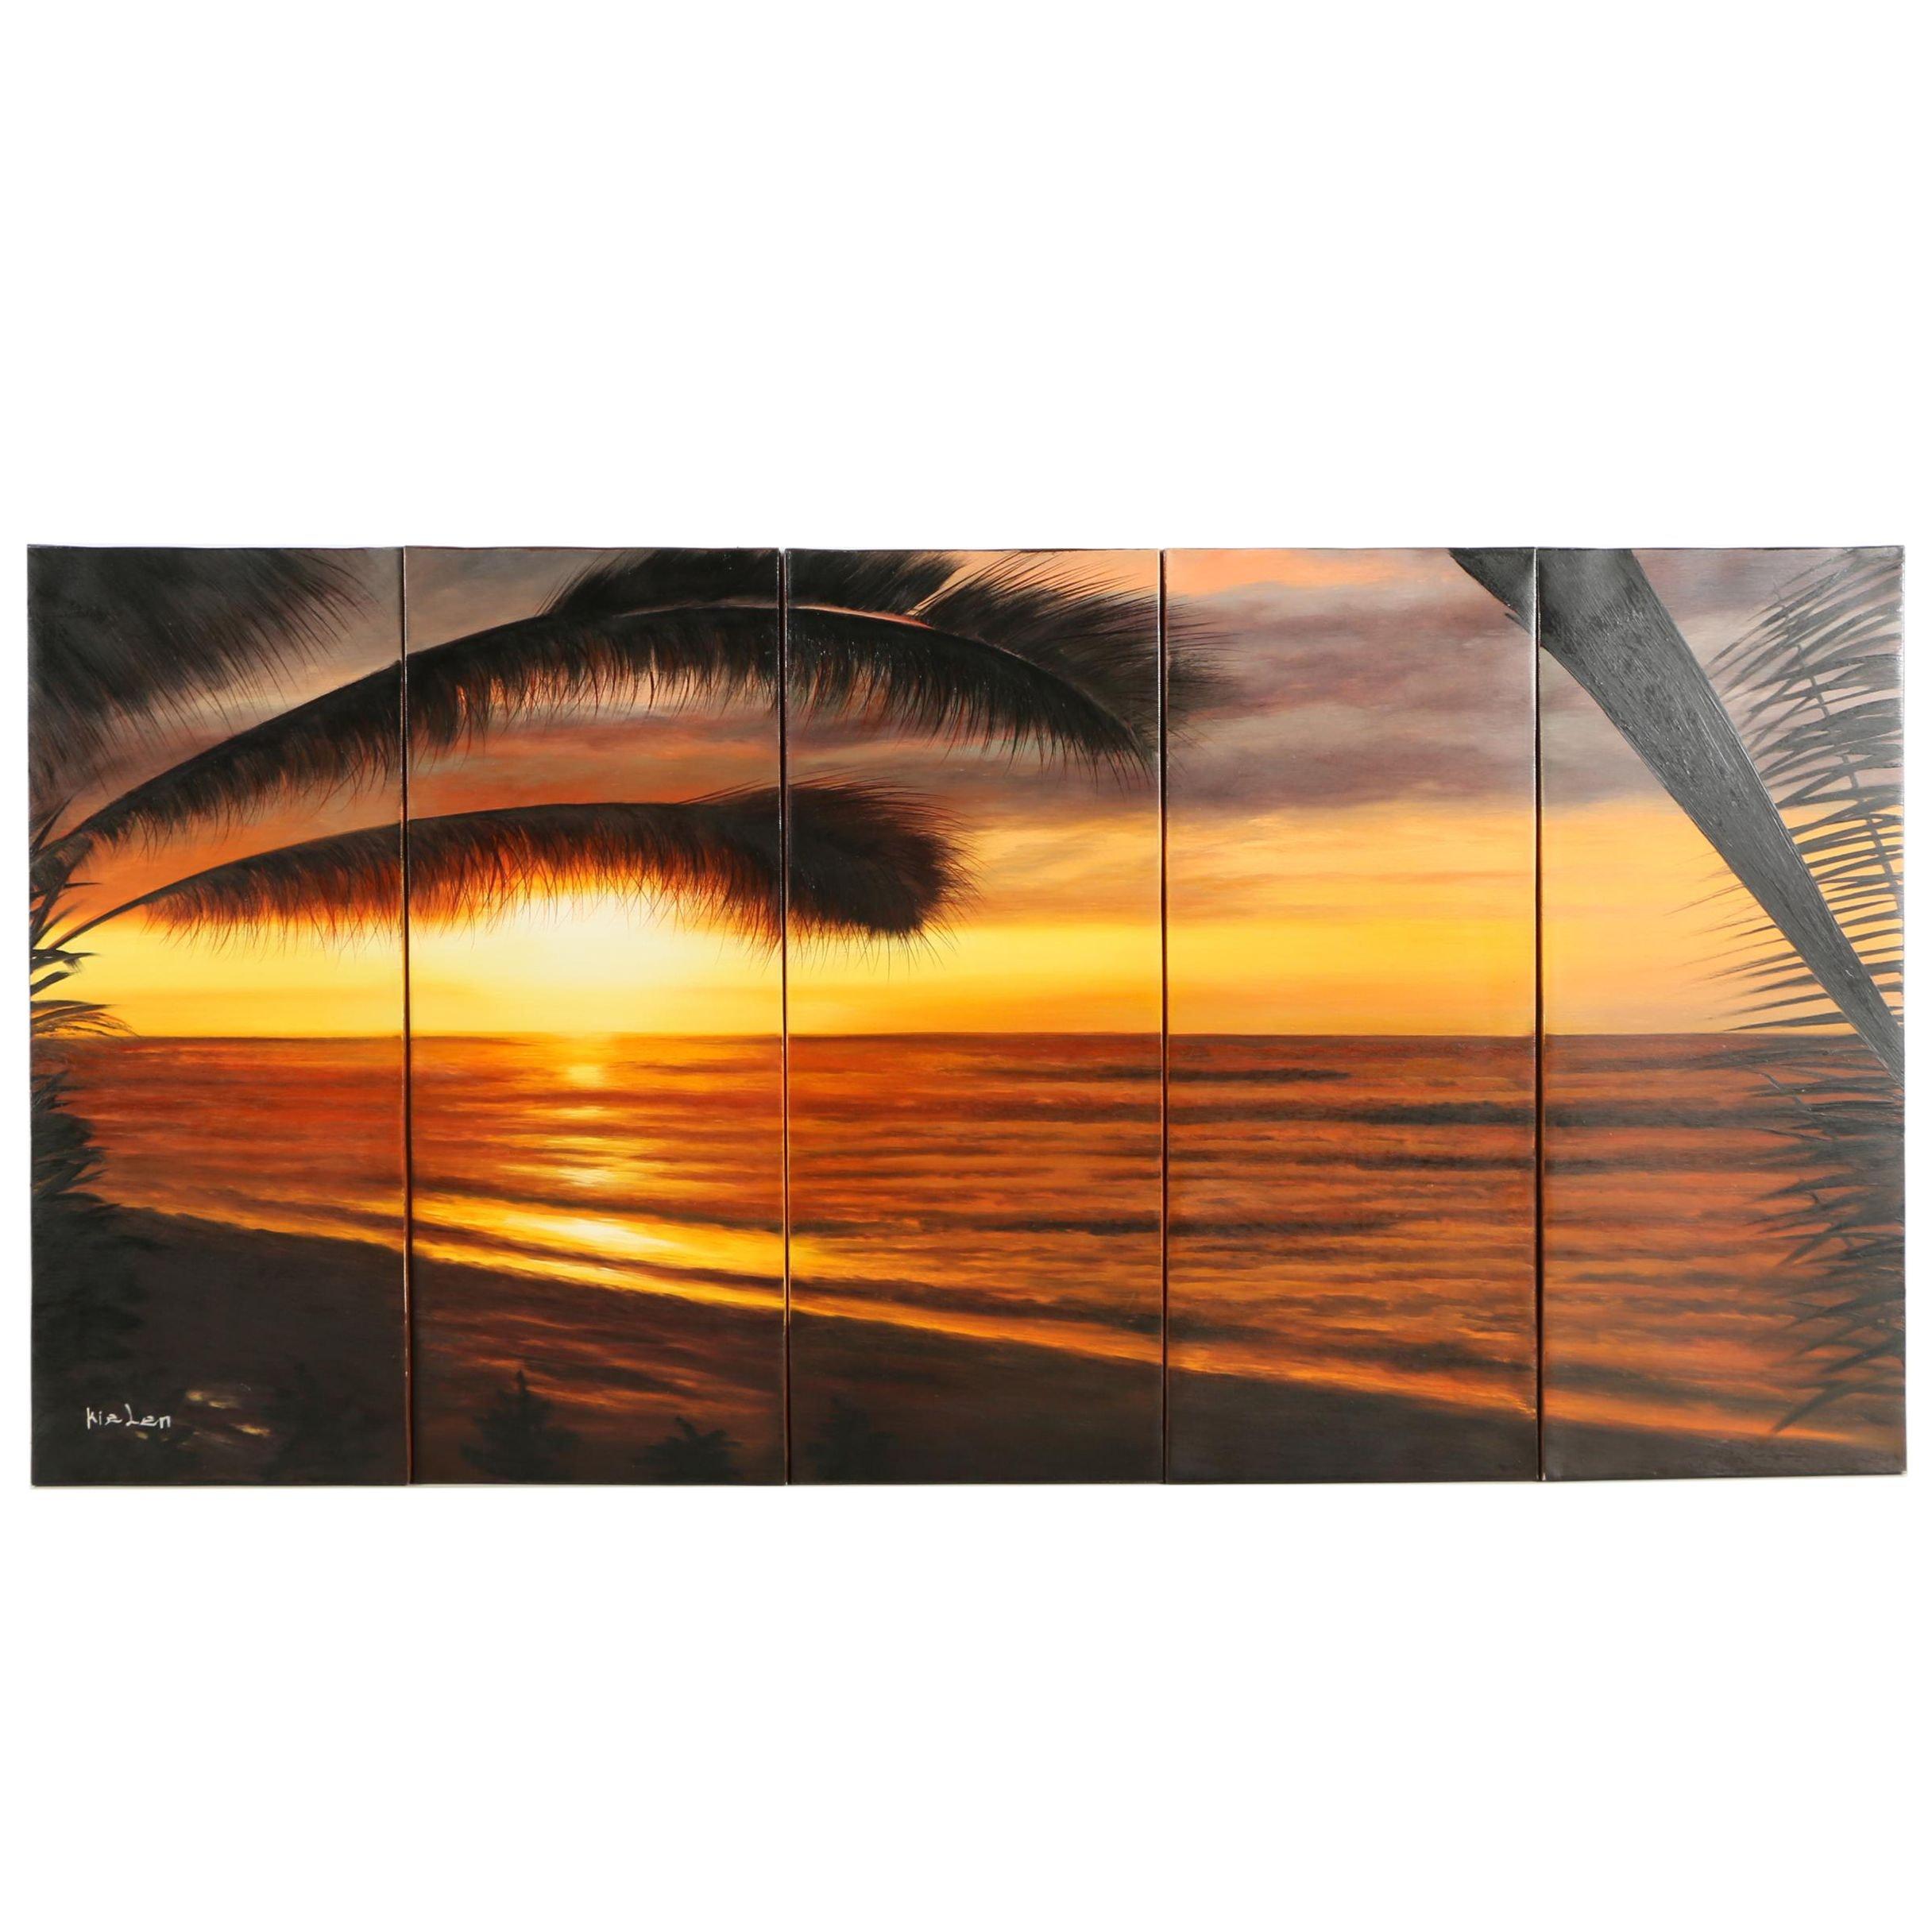 Kielen Oil on Canvas Polyptych of a Tropical Landscape